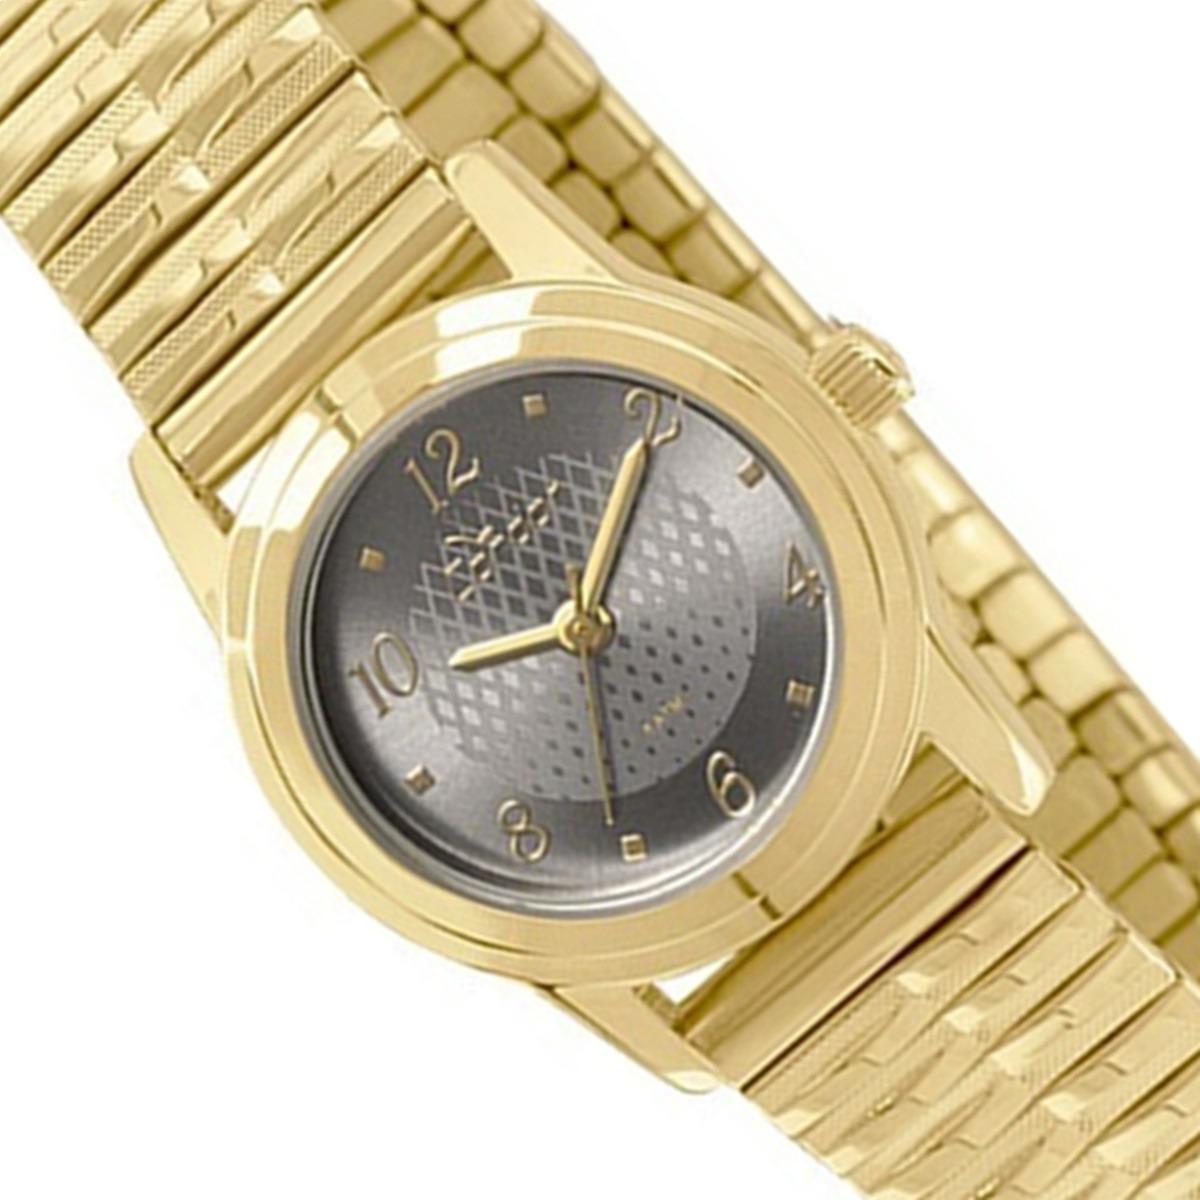 a9b4f095430 Relógio Condor Feminino Pequeno Social Dourado Co2035kqh 4c - R  155 ...